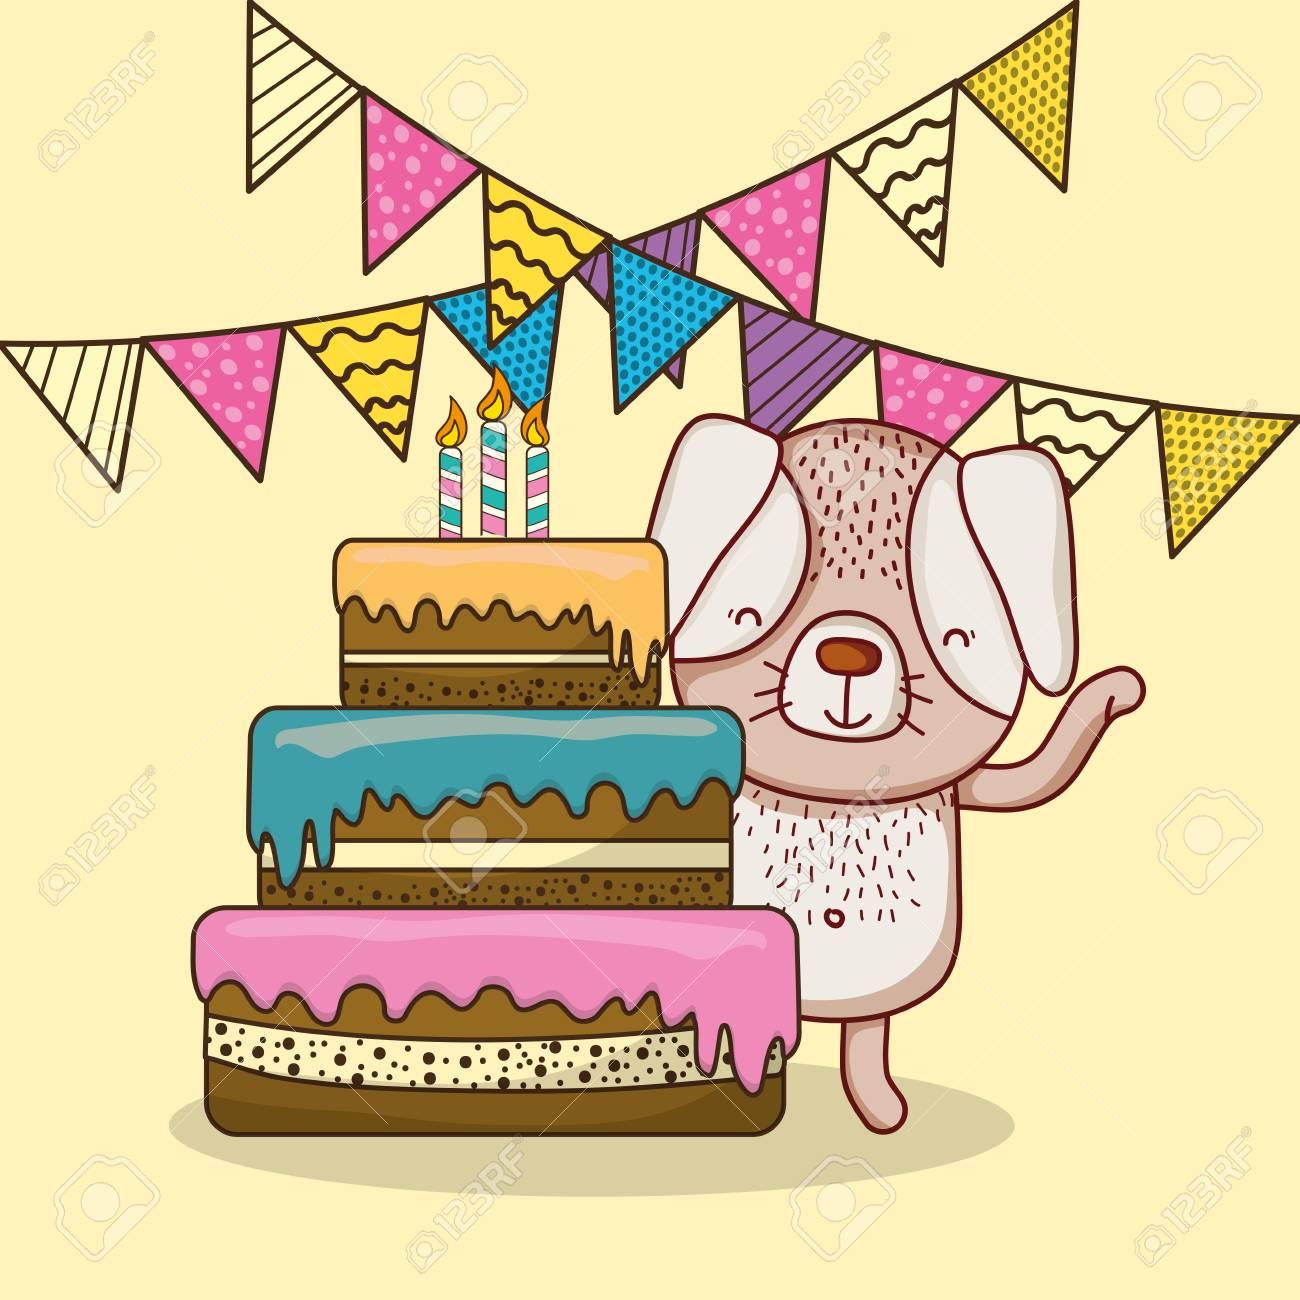 Happy Birthday Card With Cute Animal Cartoon Vector Illustration